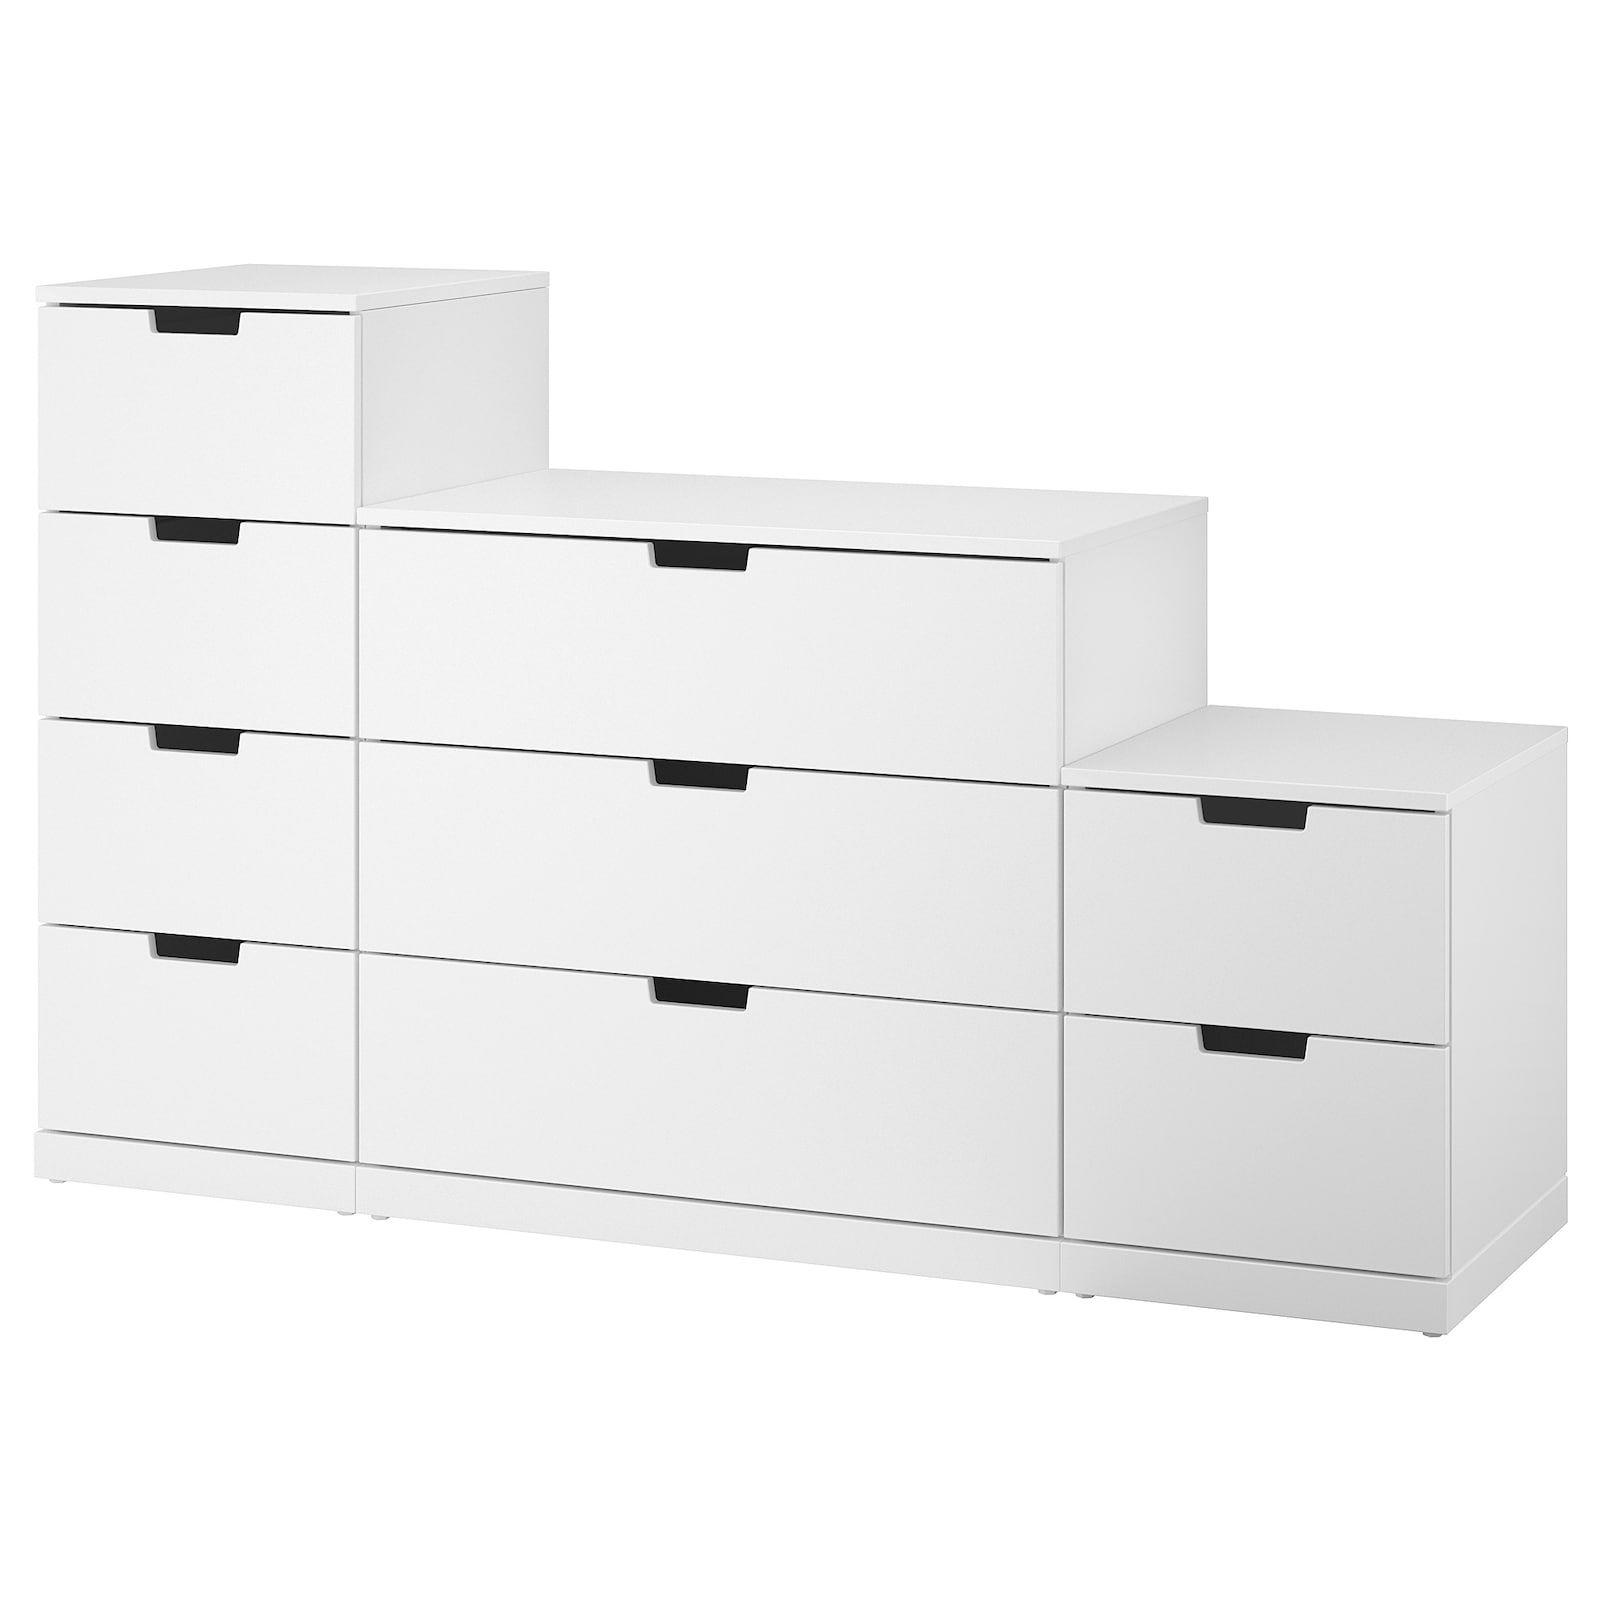 Nordli Ladekast 9 Lades Wit 160x99 Cm Ikea In 2021 Ikea Nordli Headboard Storage Ikea [ 1600 x 1600 Pixel ]